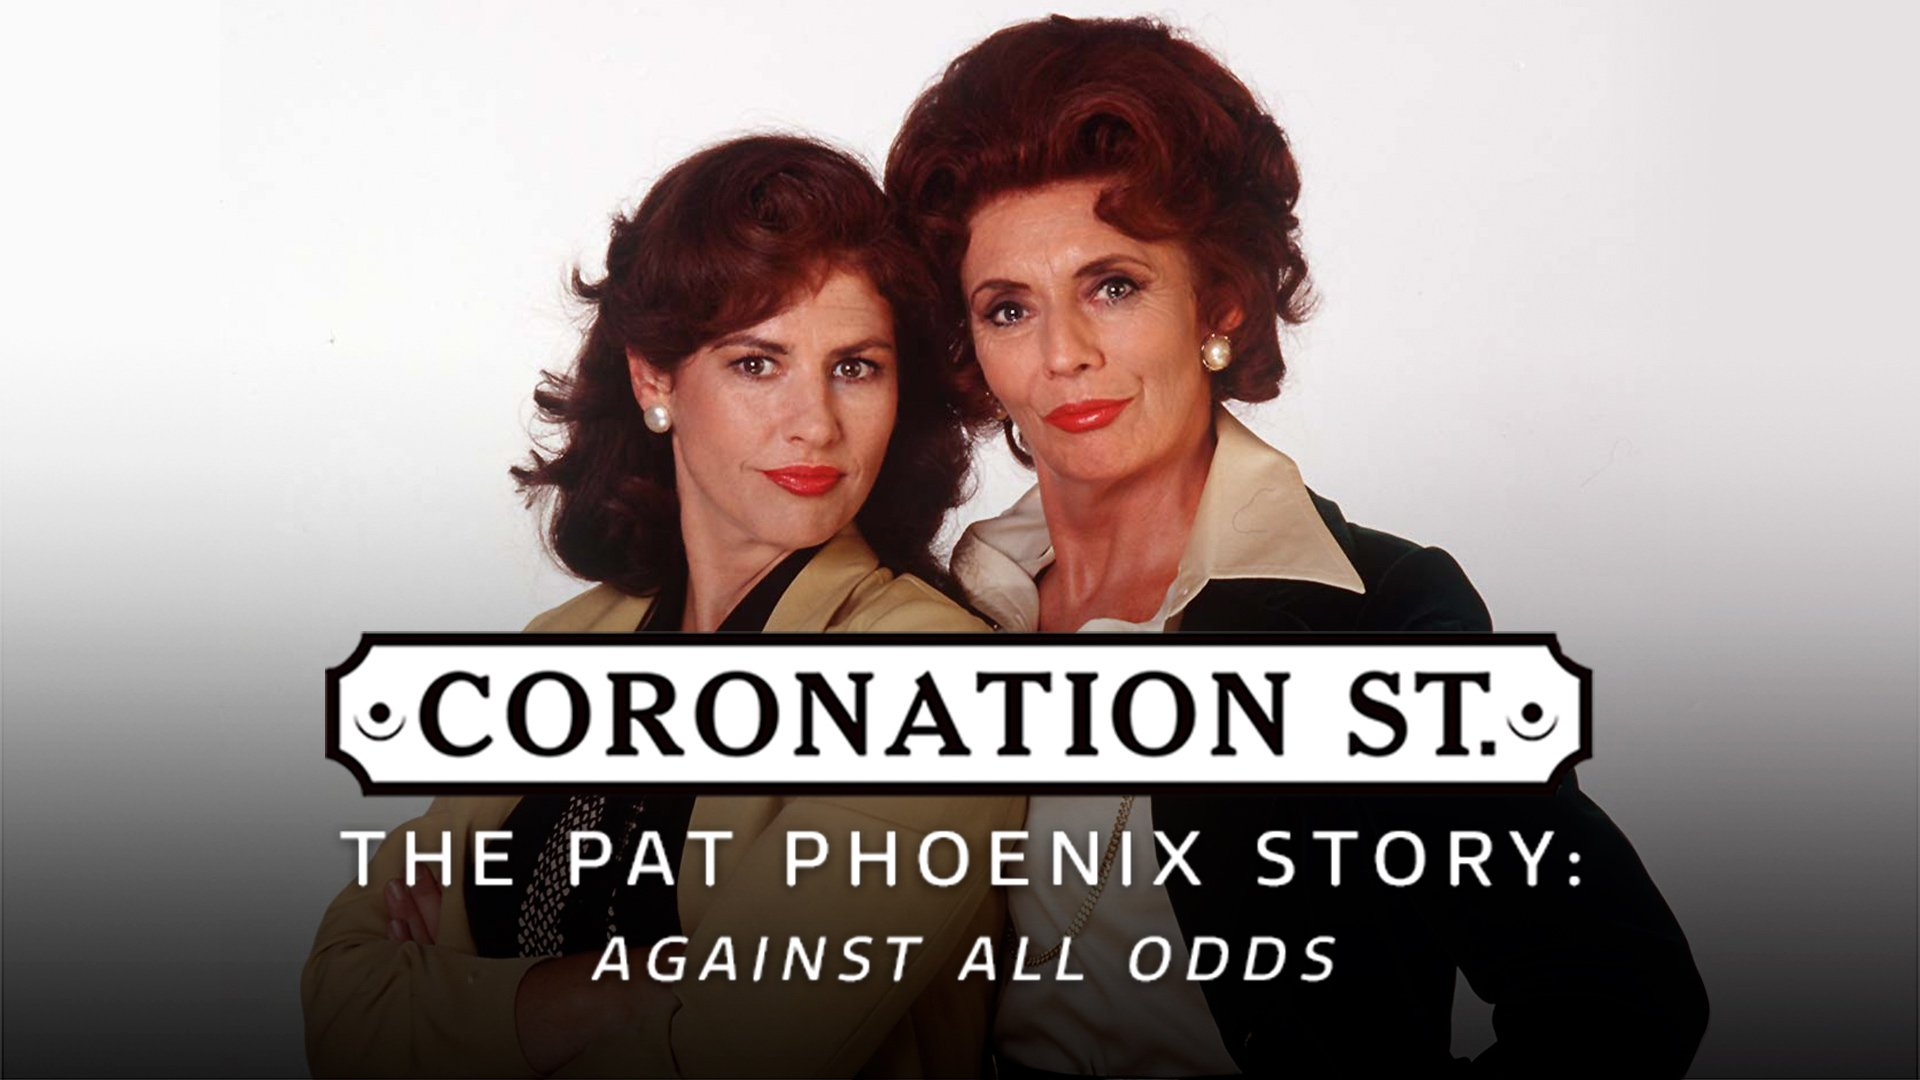 Coronation Street: The Pat Phoenix Story on BritBox UK